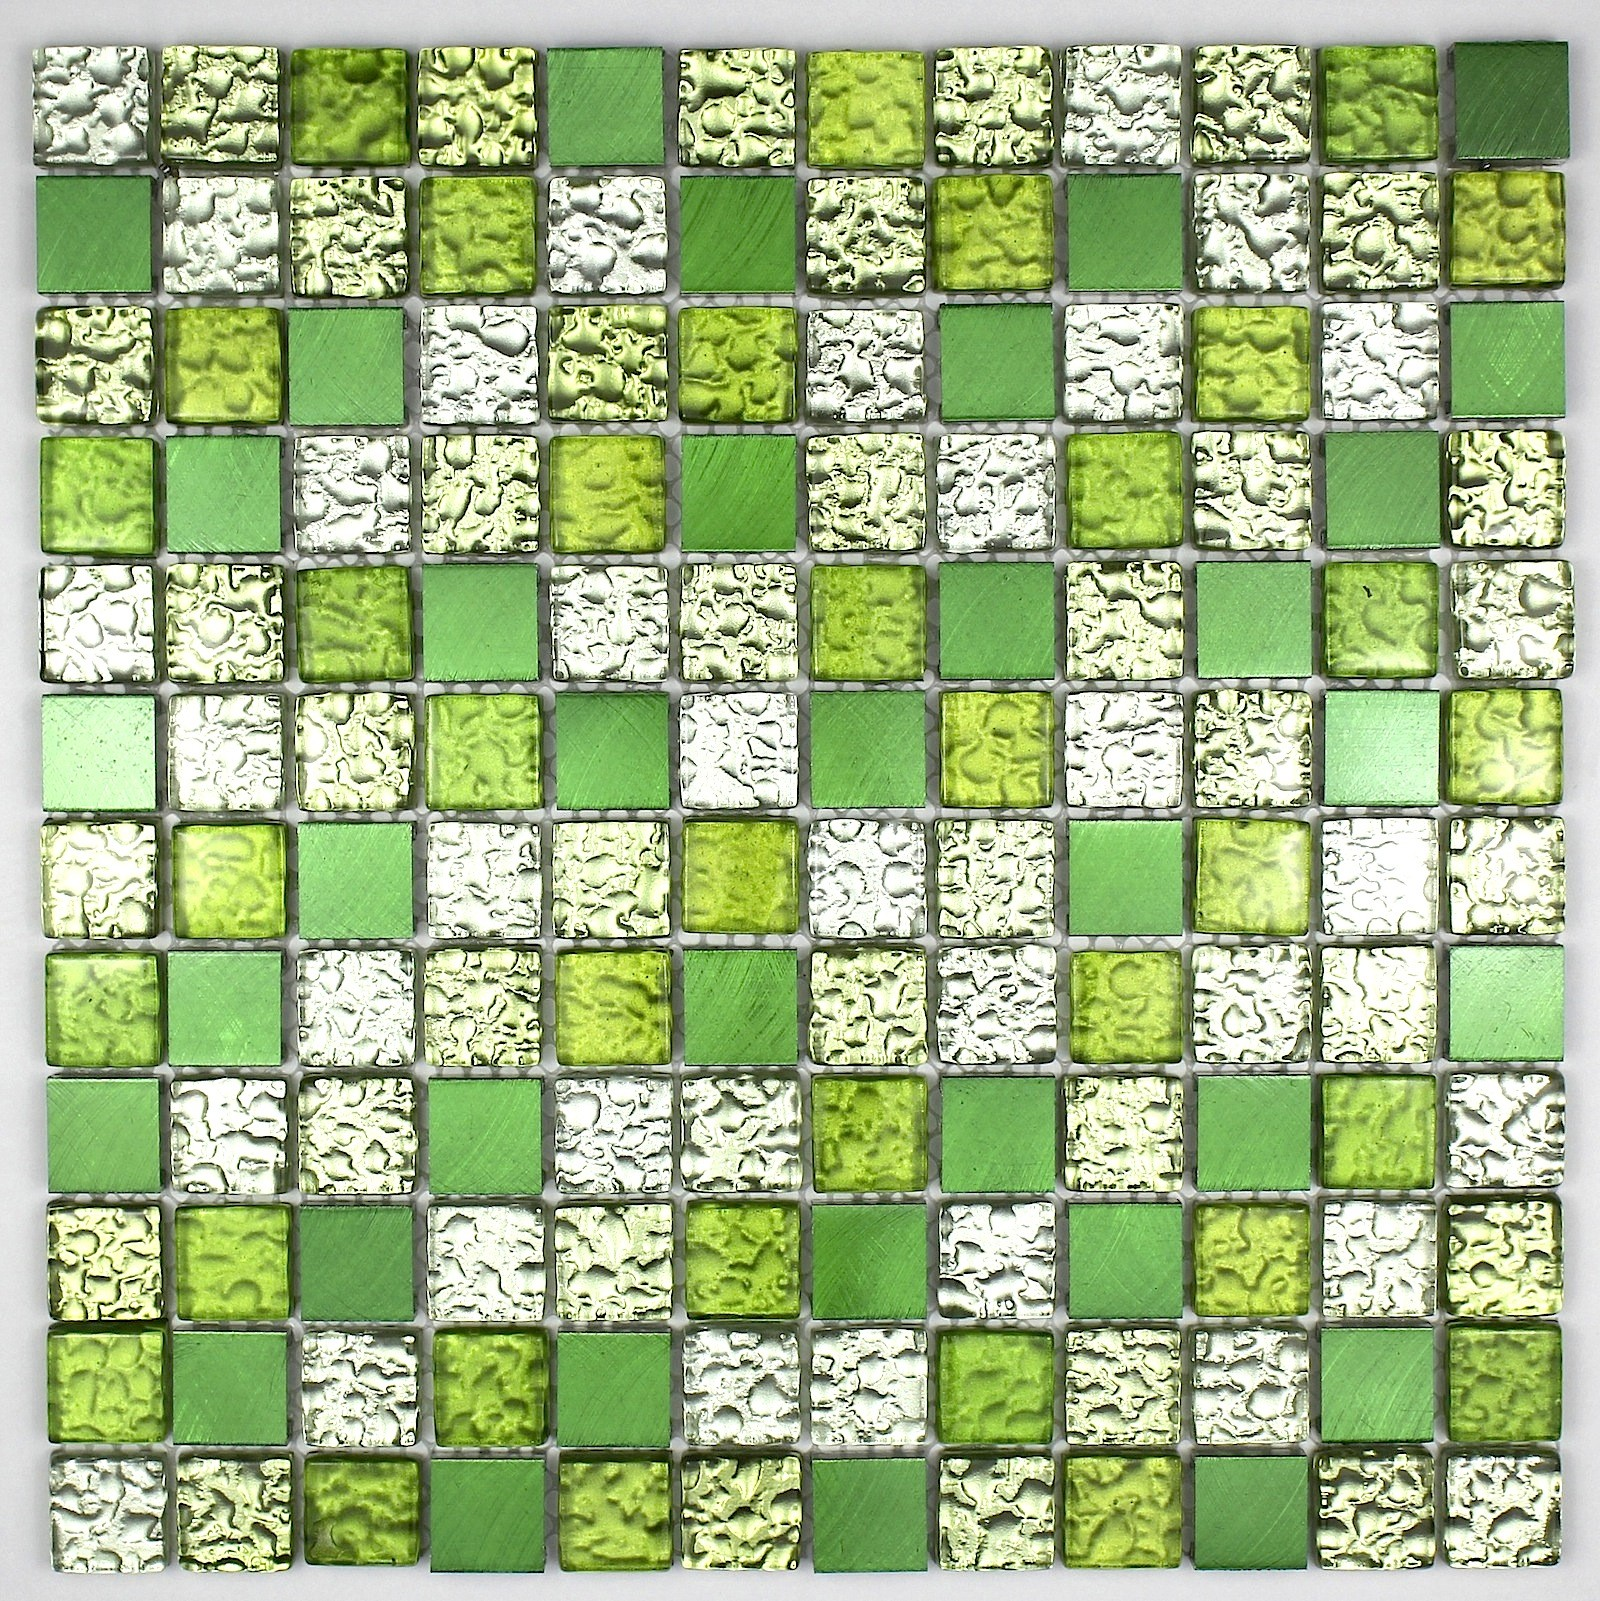 Aluminium And Glass Splashback Kitchen Cm Nomad Green Mosaic